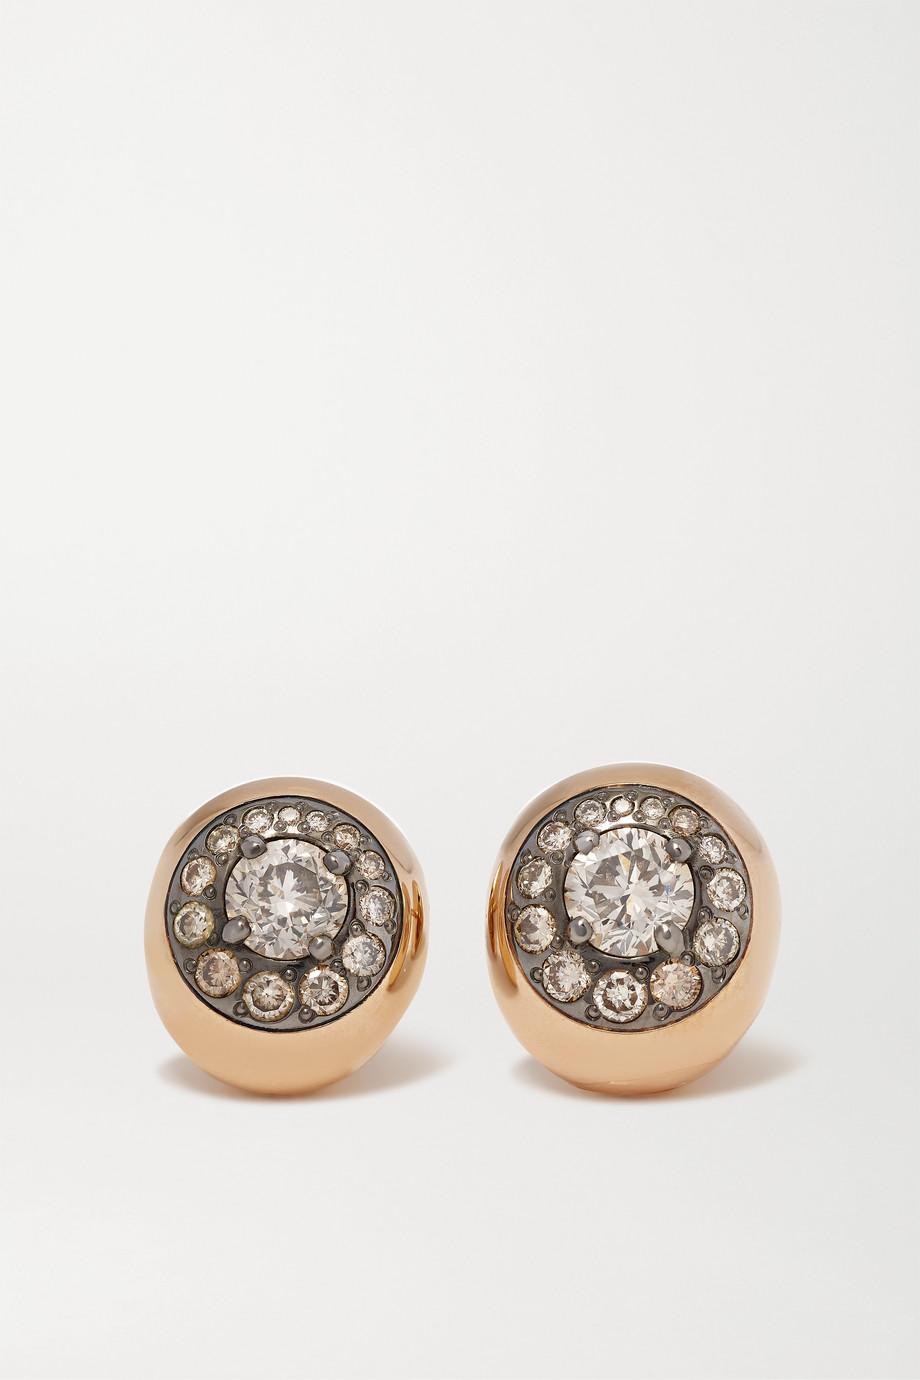 Pomellato Nuvola 18-karat rose gold diamond earrings